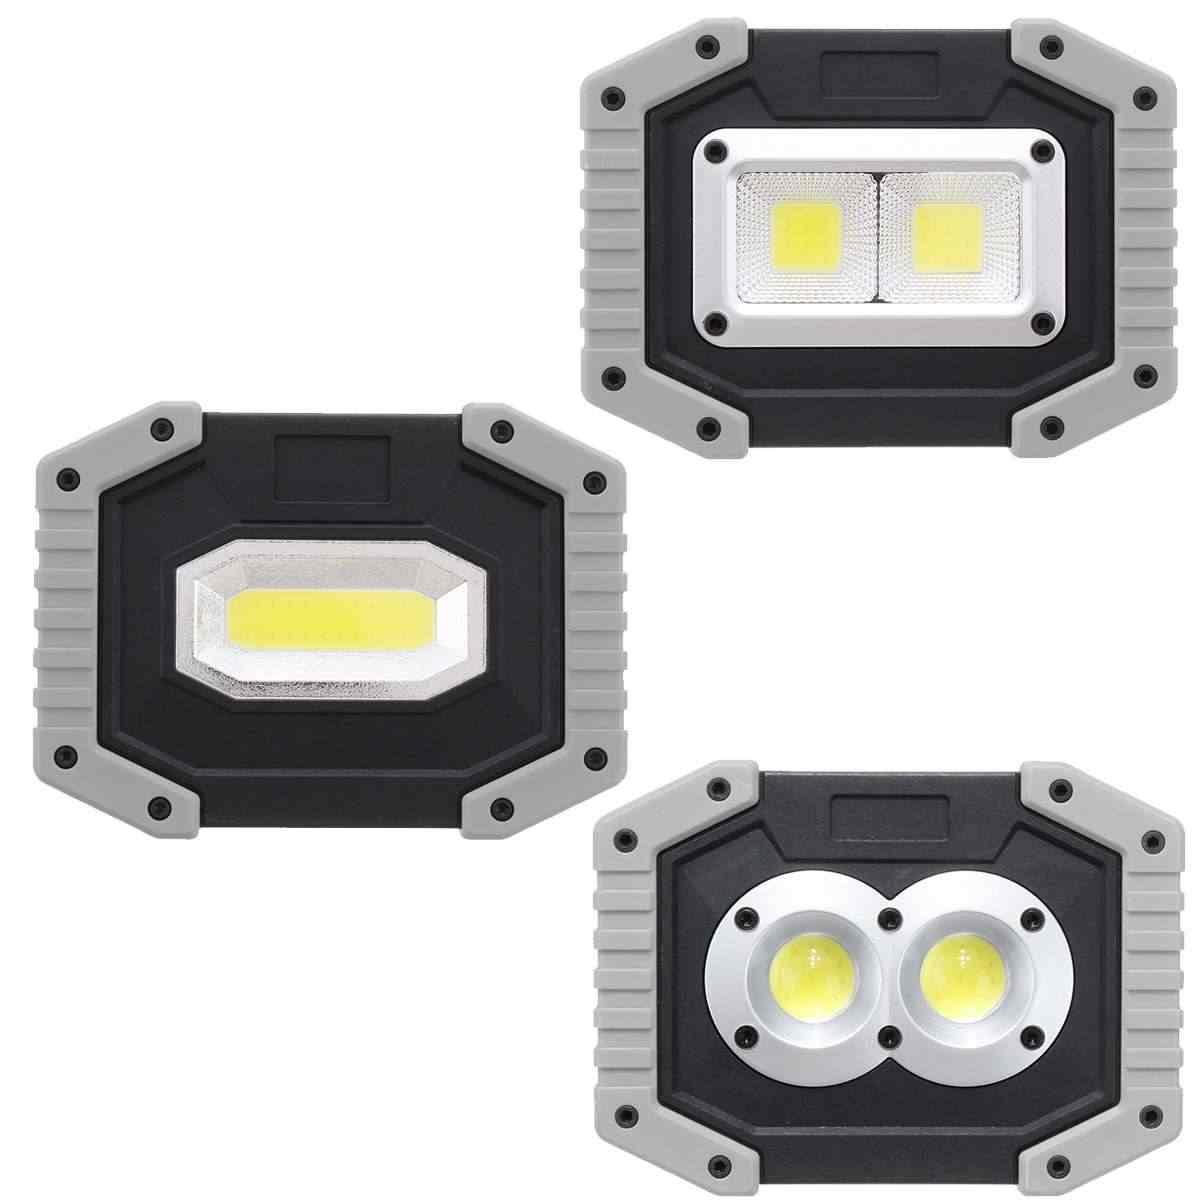 CLAITE 30W USB LED Portable Spotlight COB Outdoor 3 Modes Work Light Camping Emergency Lantern Flashlight Spotlight Searchlight